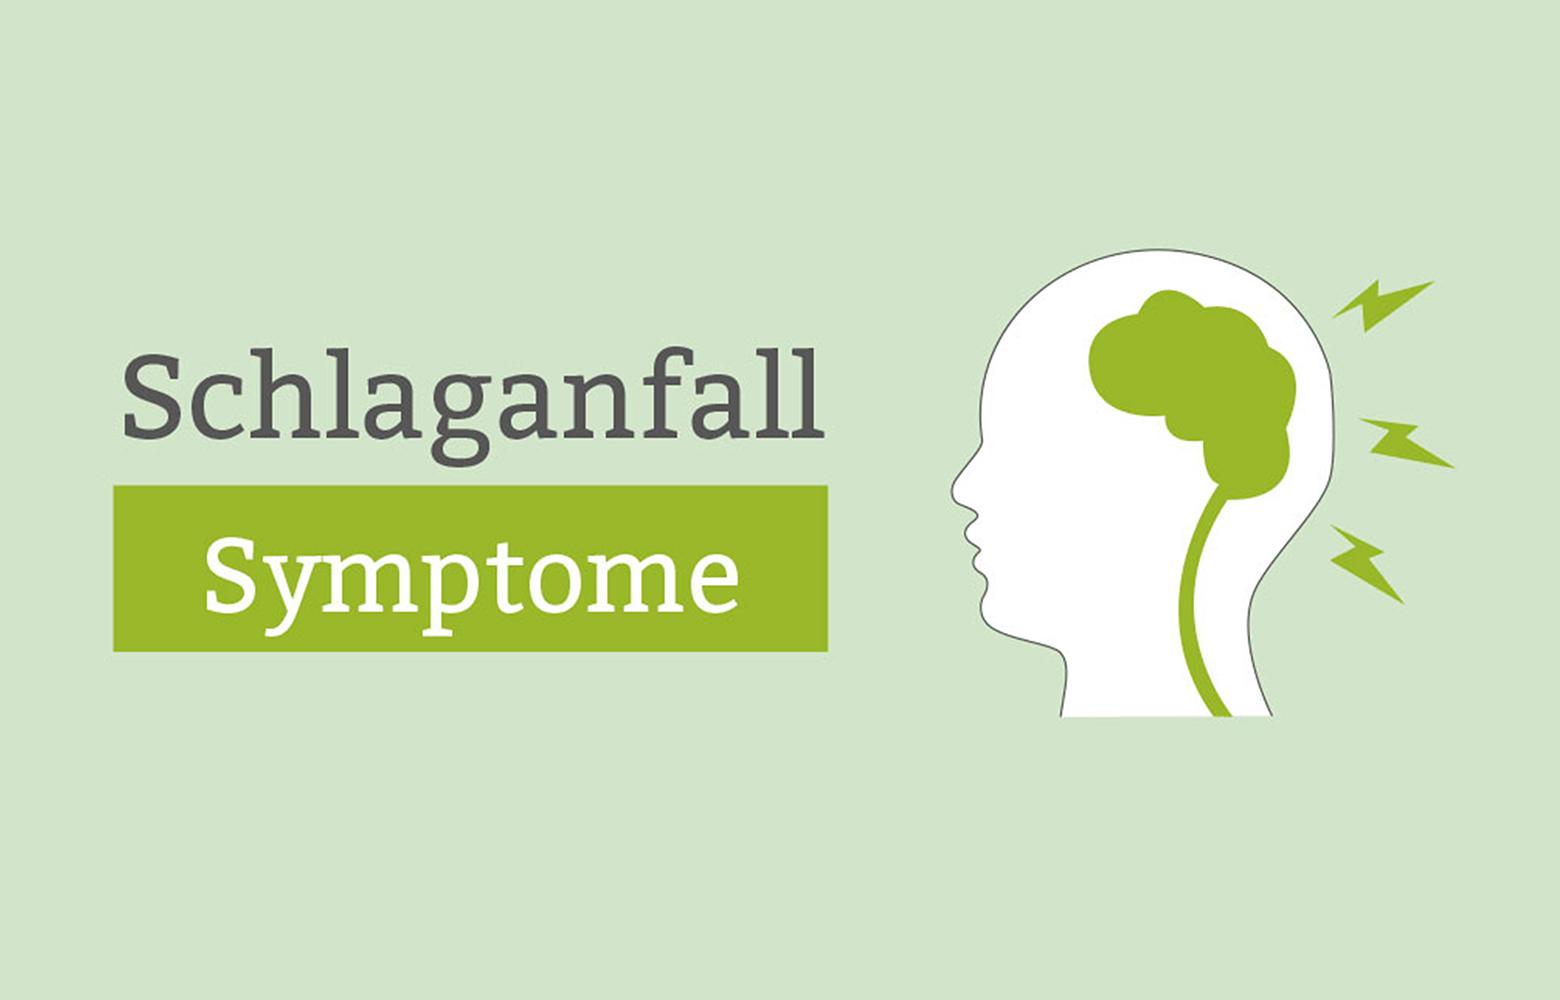 herzinfarkt vorboten symptome